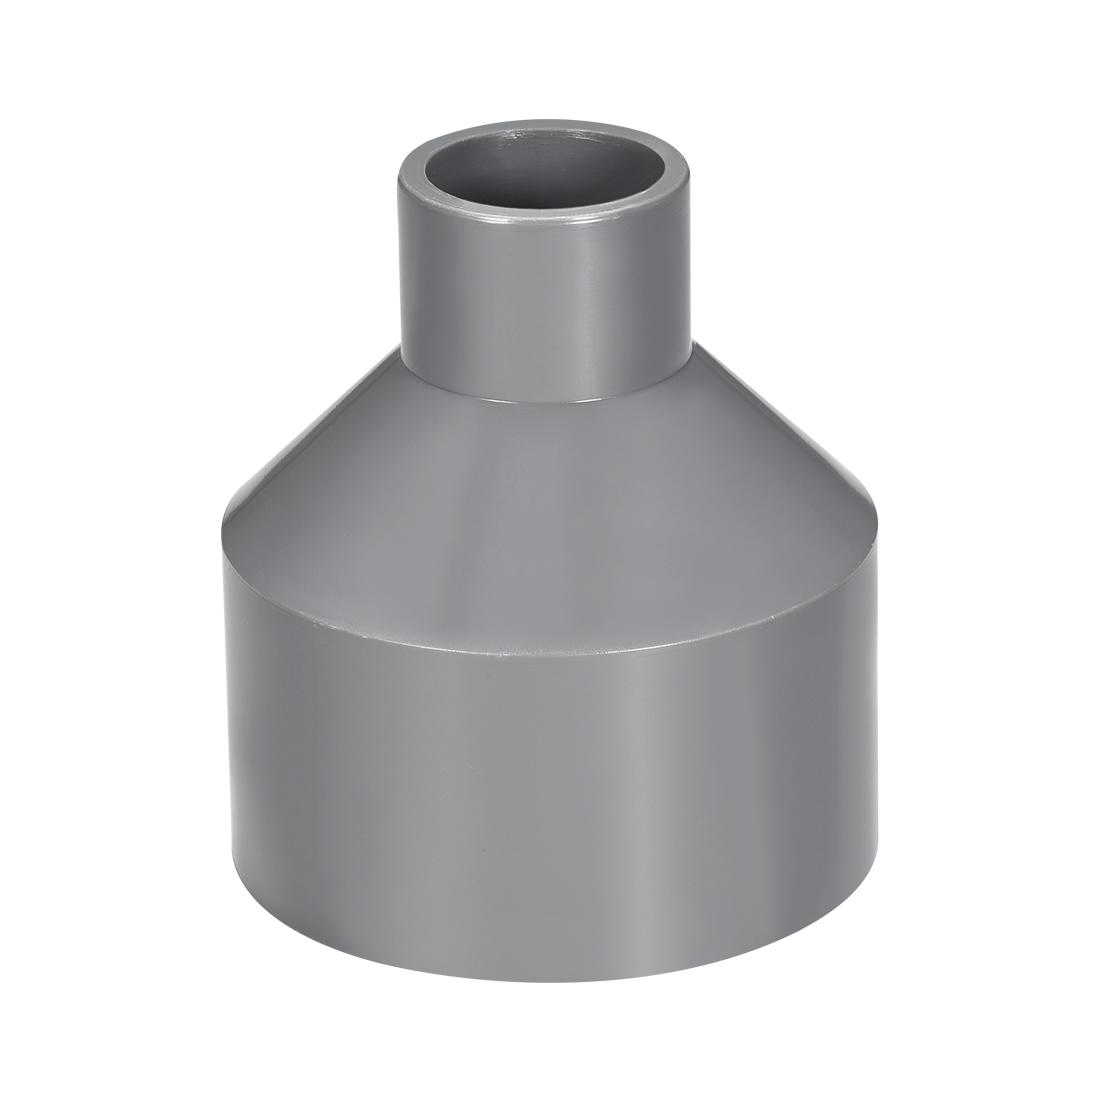 75mm x 32mm PVC Reducing Coupling Hub by Hub, DWV Pipe Fittings Gray